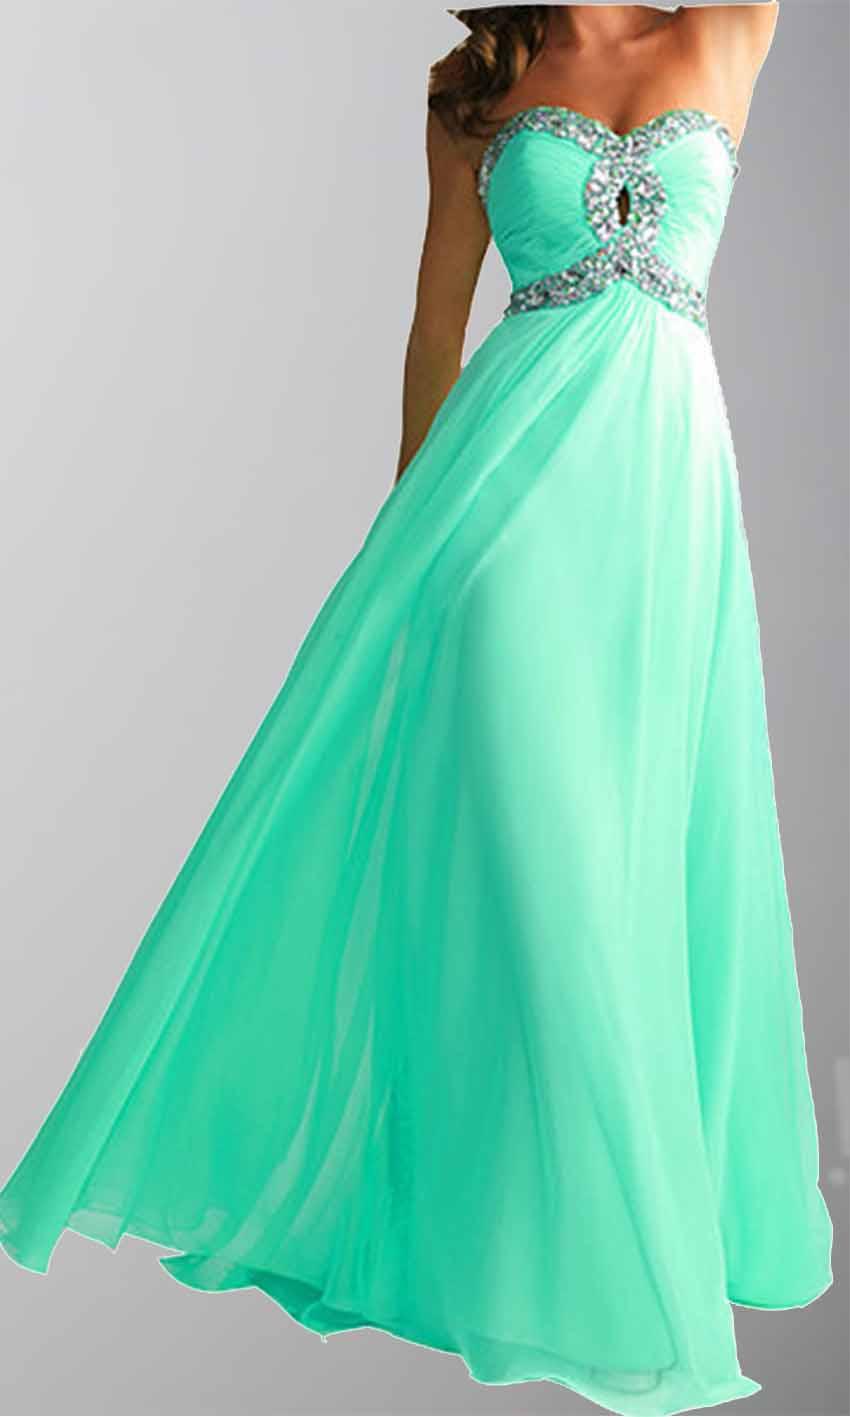 Old Fashioned Green Prom Dress Uk Frieze - All Wedding Dresses ...